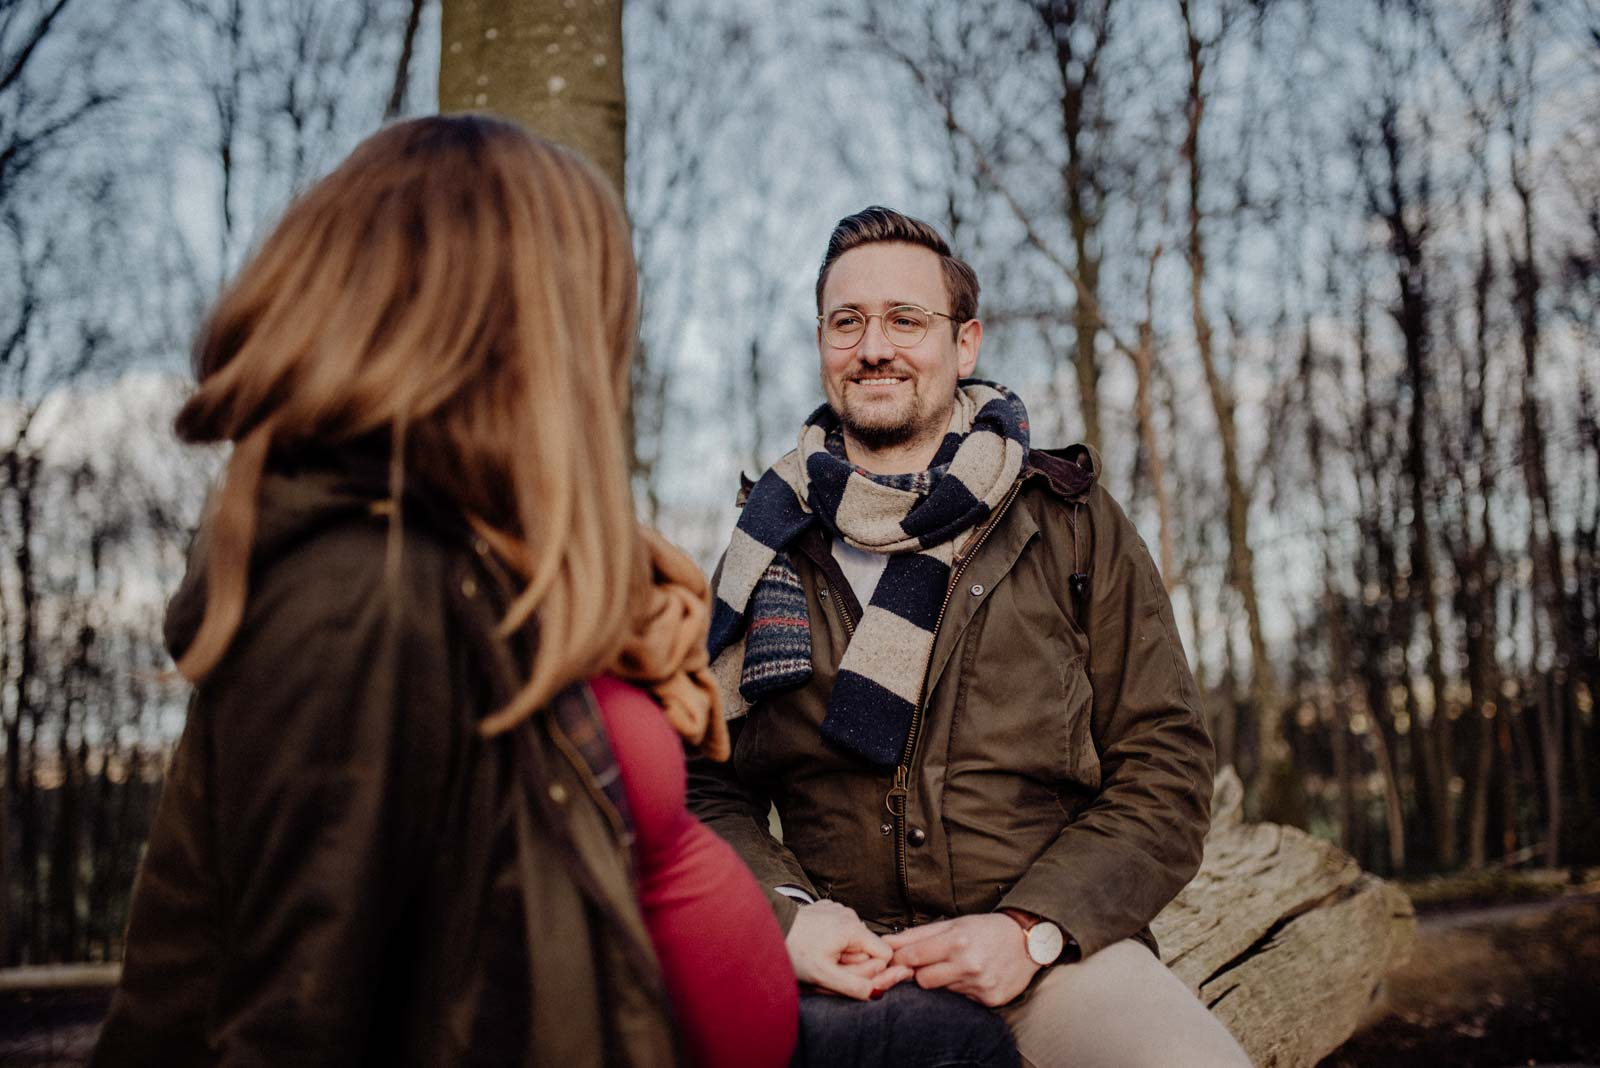 009-Babybauch-Shooting-Wald-Natur-Witten-Familienfotografie-Familienfotos